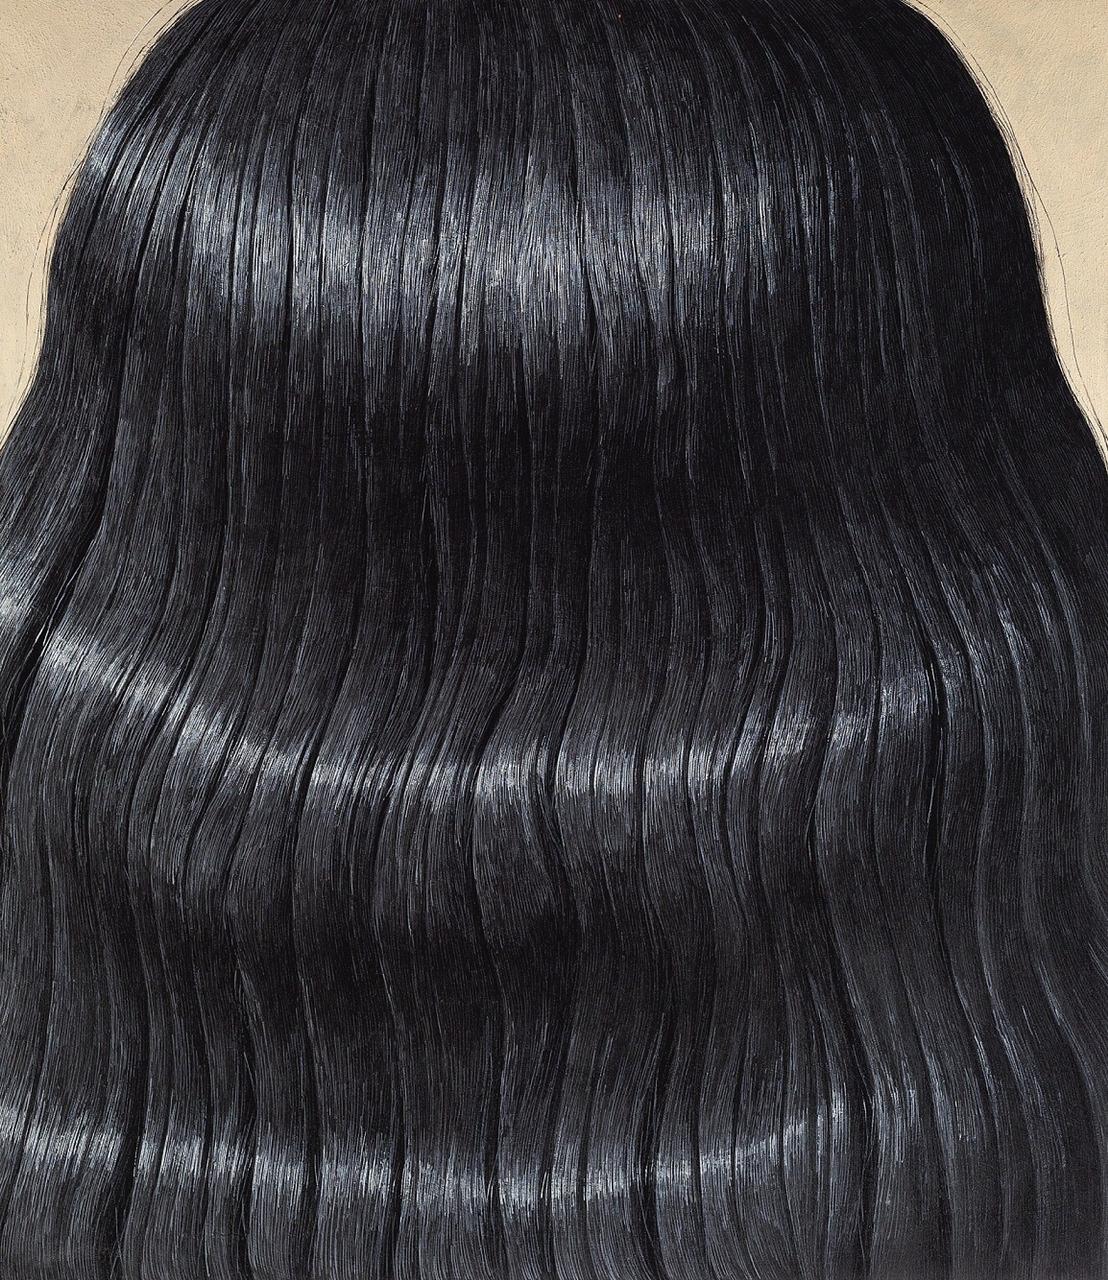 Domenico-Gnoli-Black-Hair.jpg